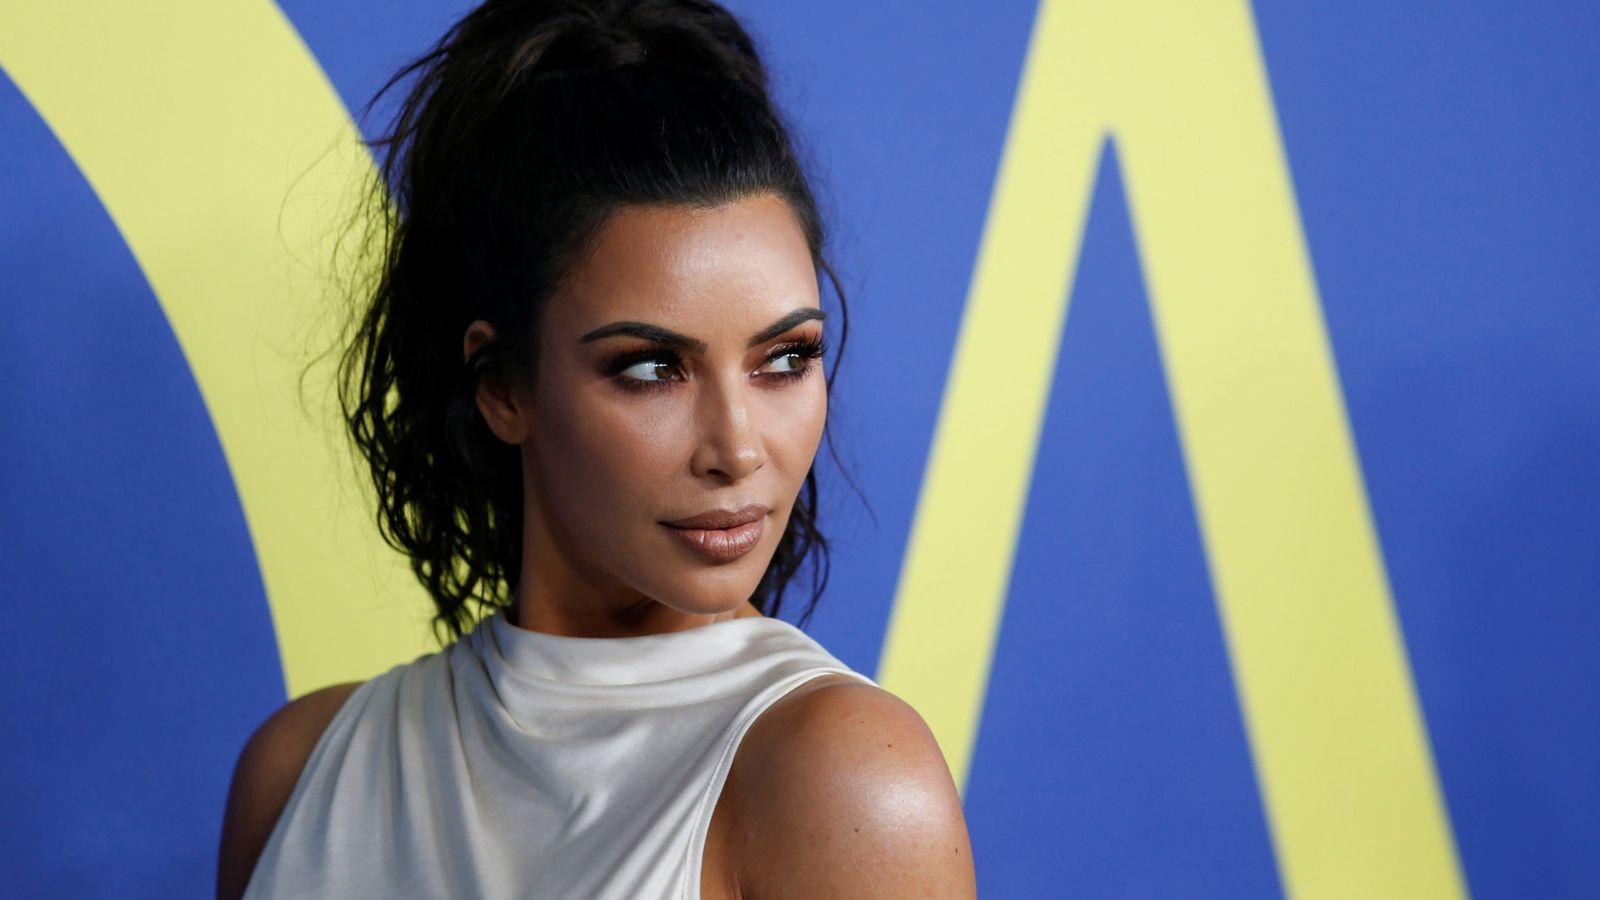 Foto: Kim Kardashian en una entrega de premios. (Reuters)